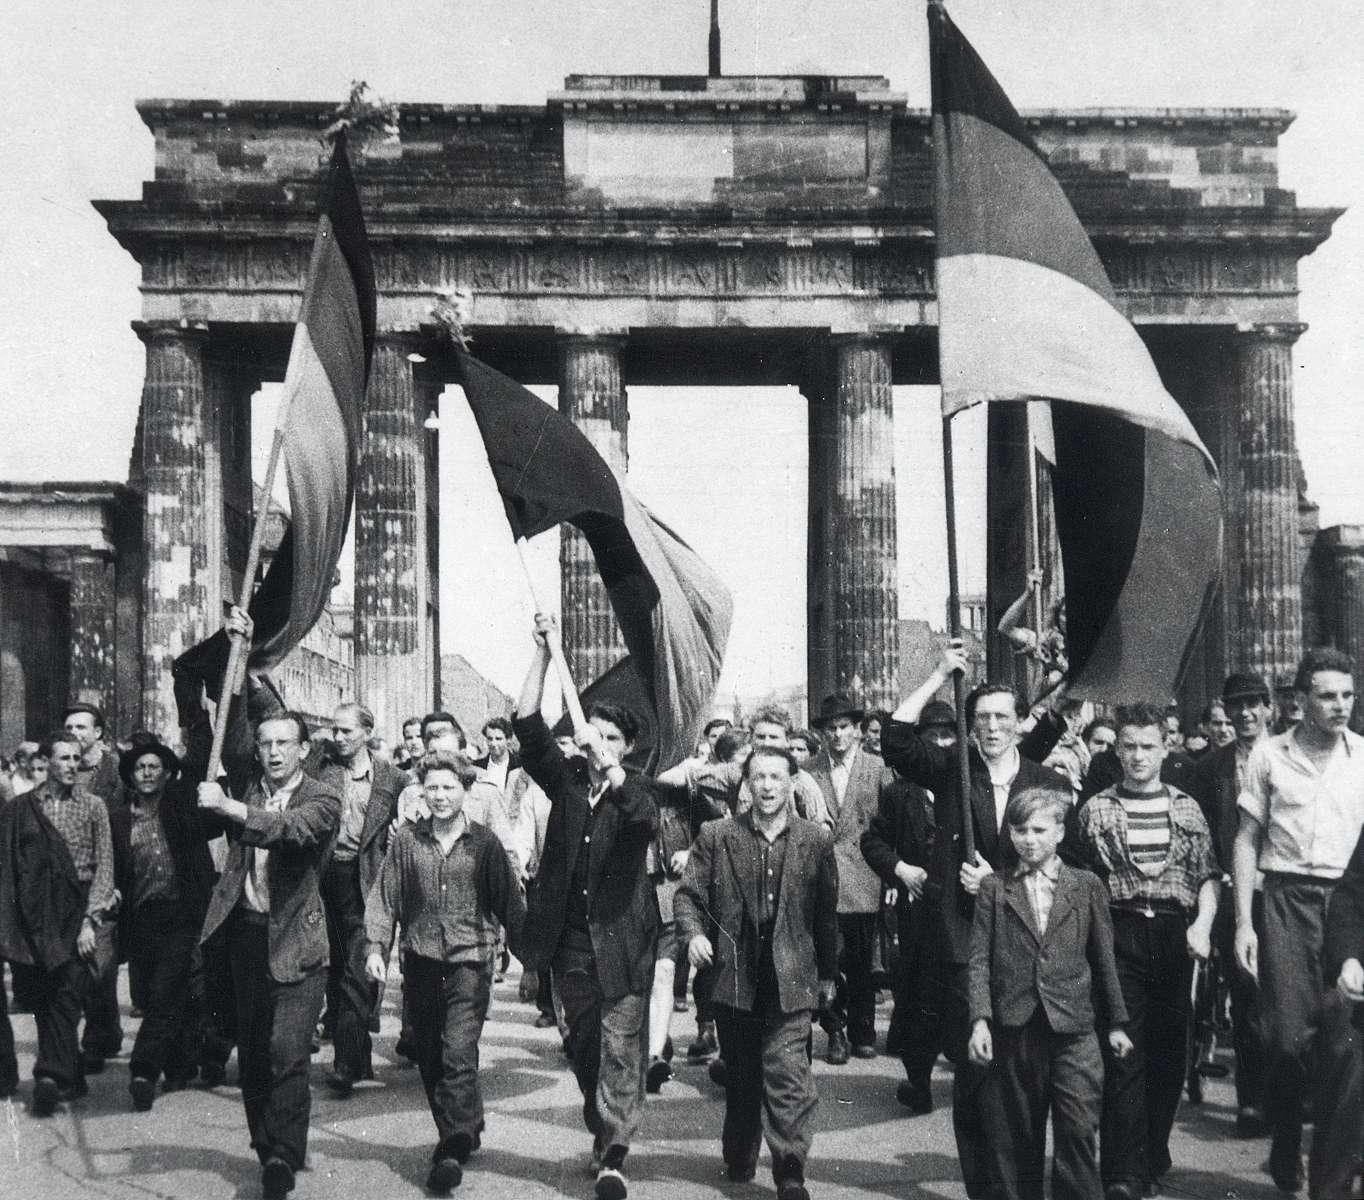 Zehn fotos aus der geschichte berlins